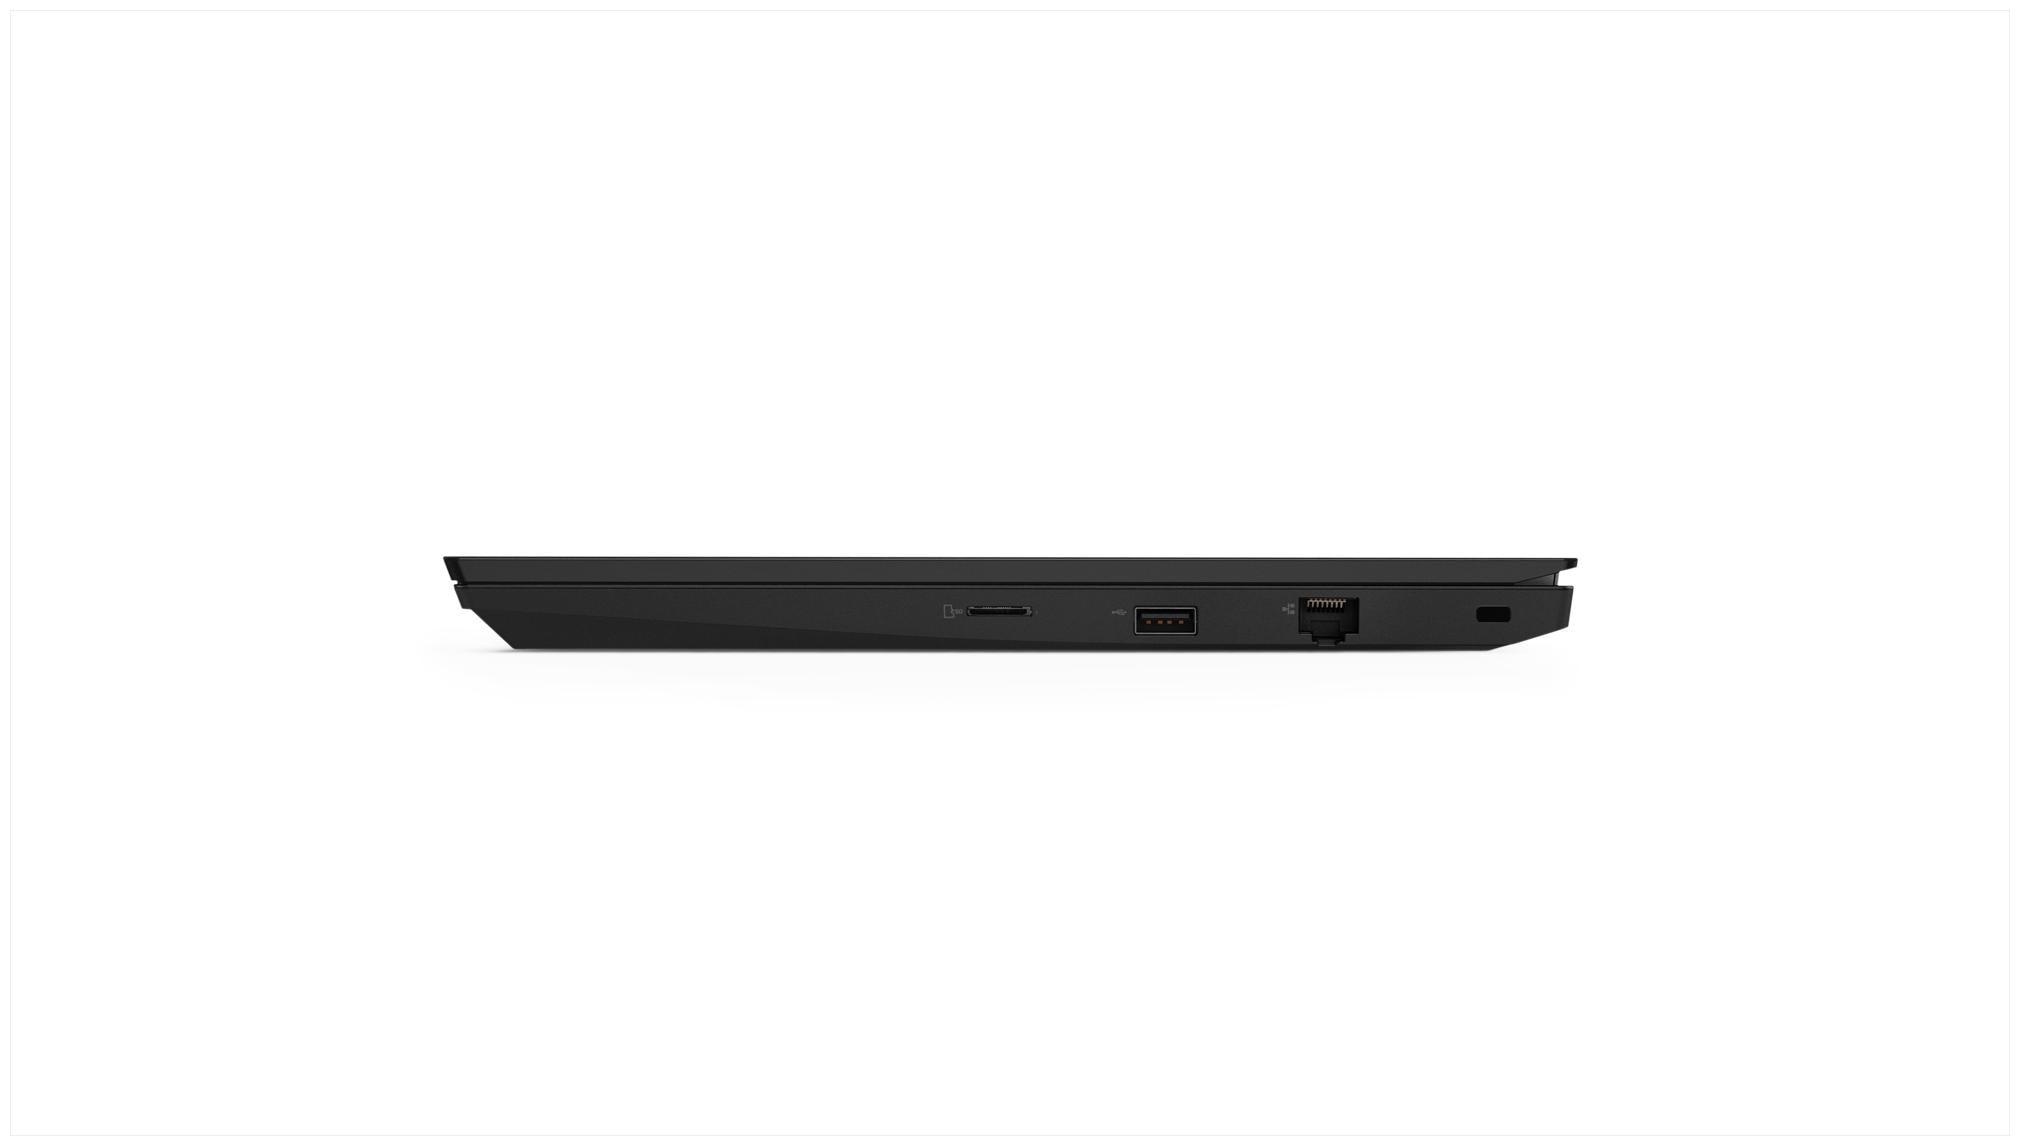 Lenovo ThinkPad E480 (Core i5 - 8th Gen / 8 GB RAM / 256 GB SSD / 35 81 cm  (14 1 Inch) Inch / DOS) 20KNS0E200 (Black ,1 75 Kg)